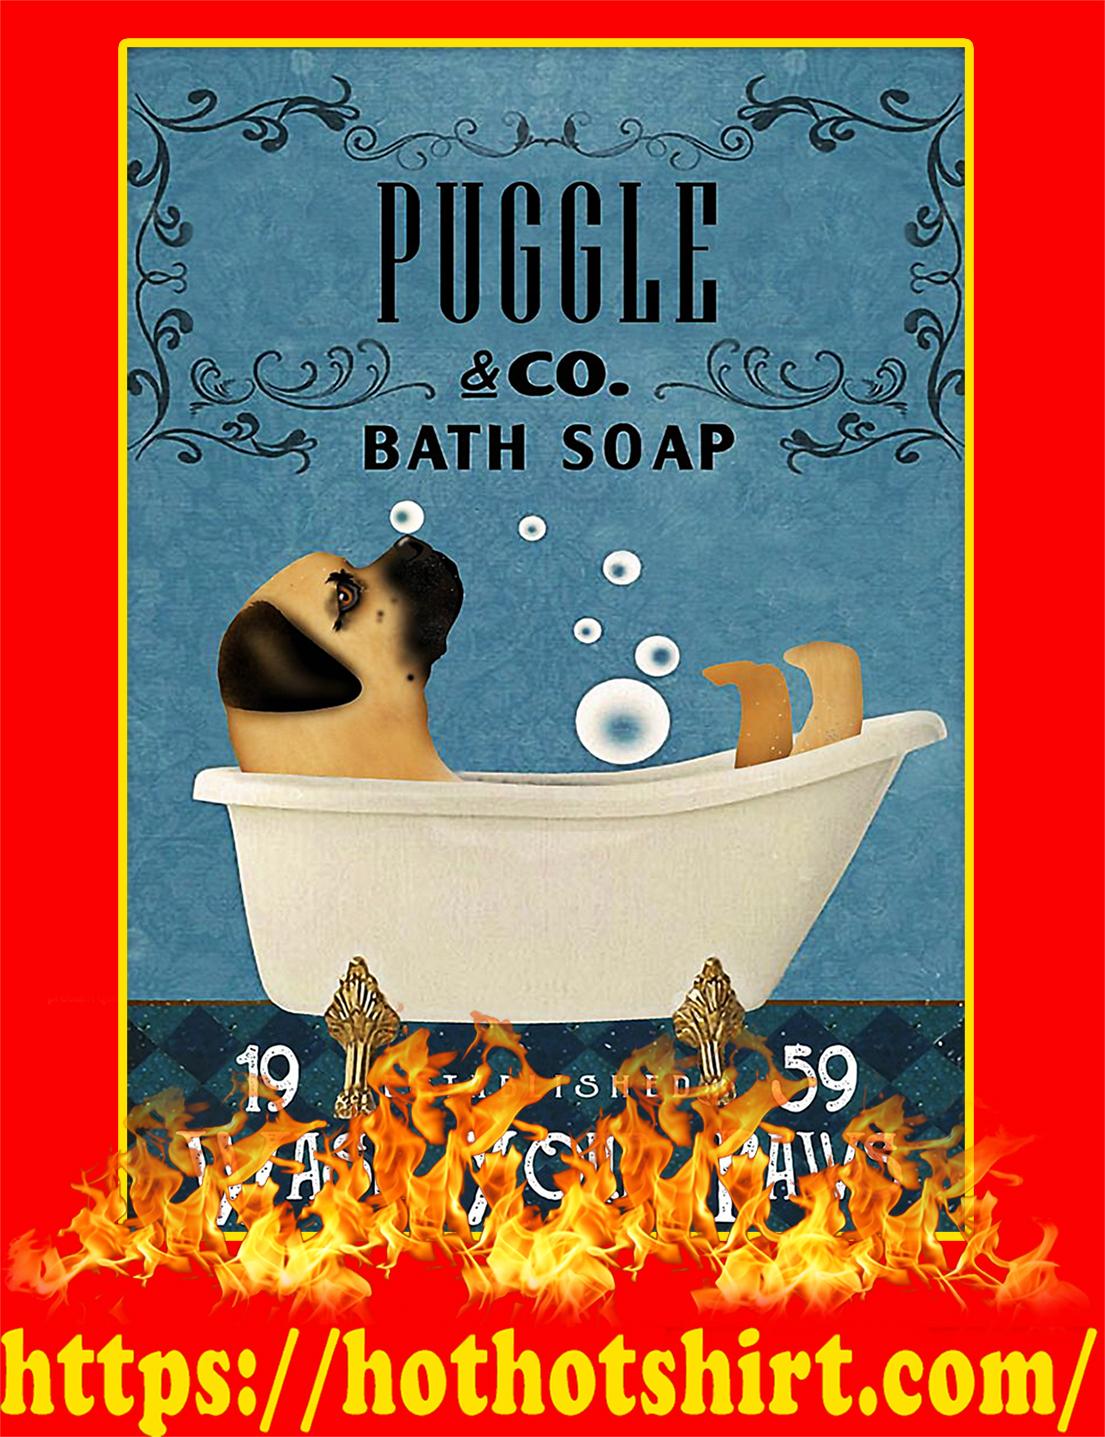 Bath Soap Company Puggle Poster - A3